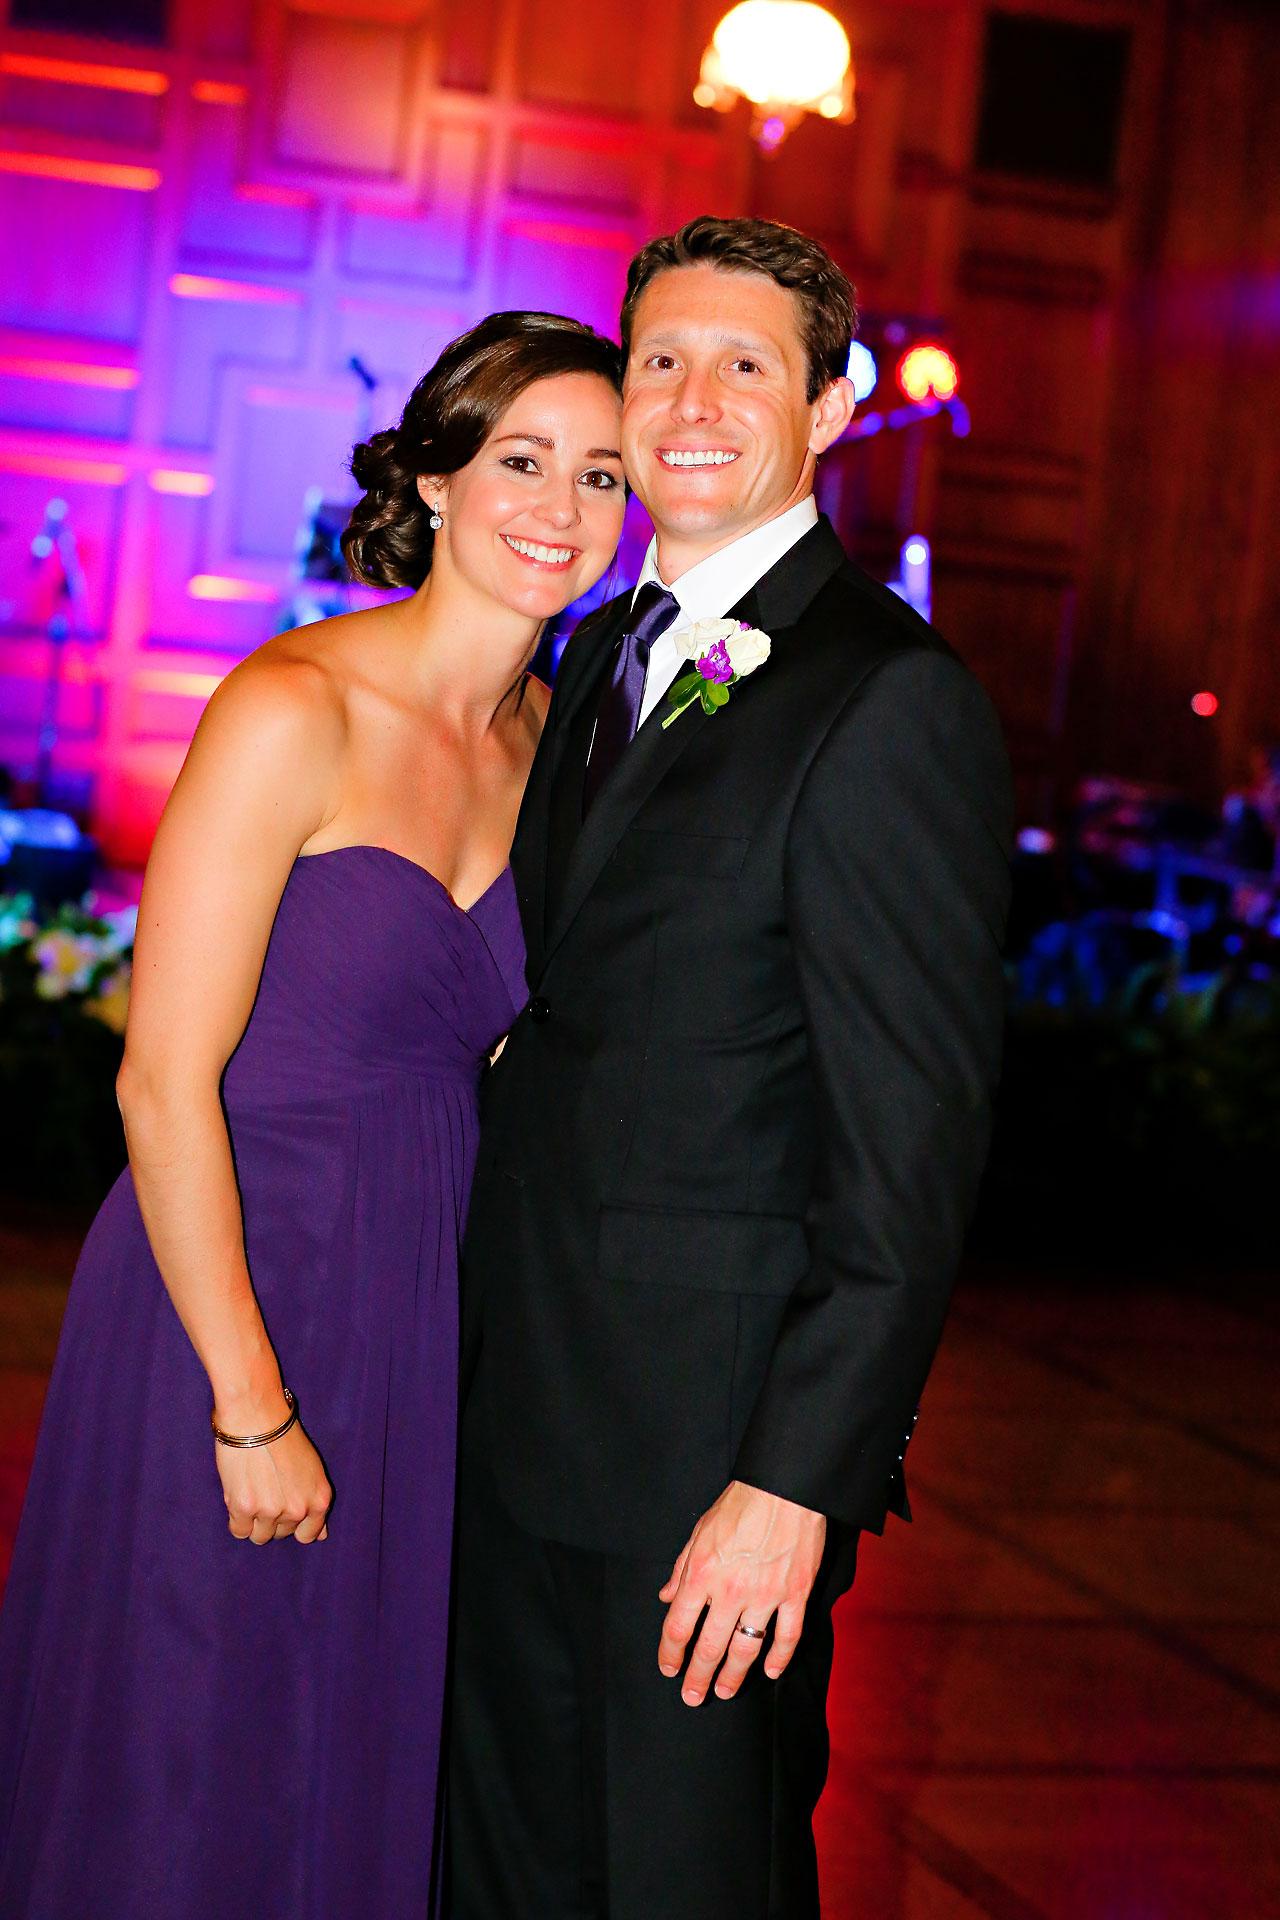 Kelly Brian Scottish Rite Wedding 256